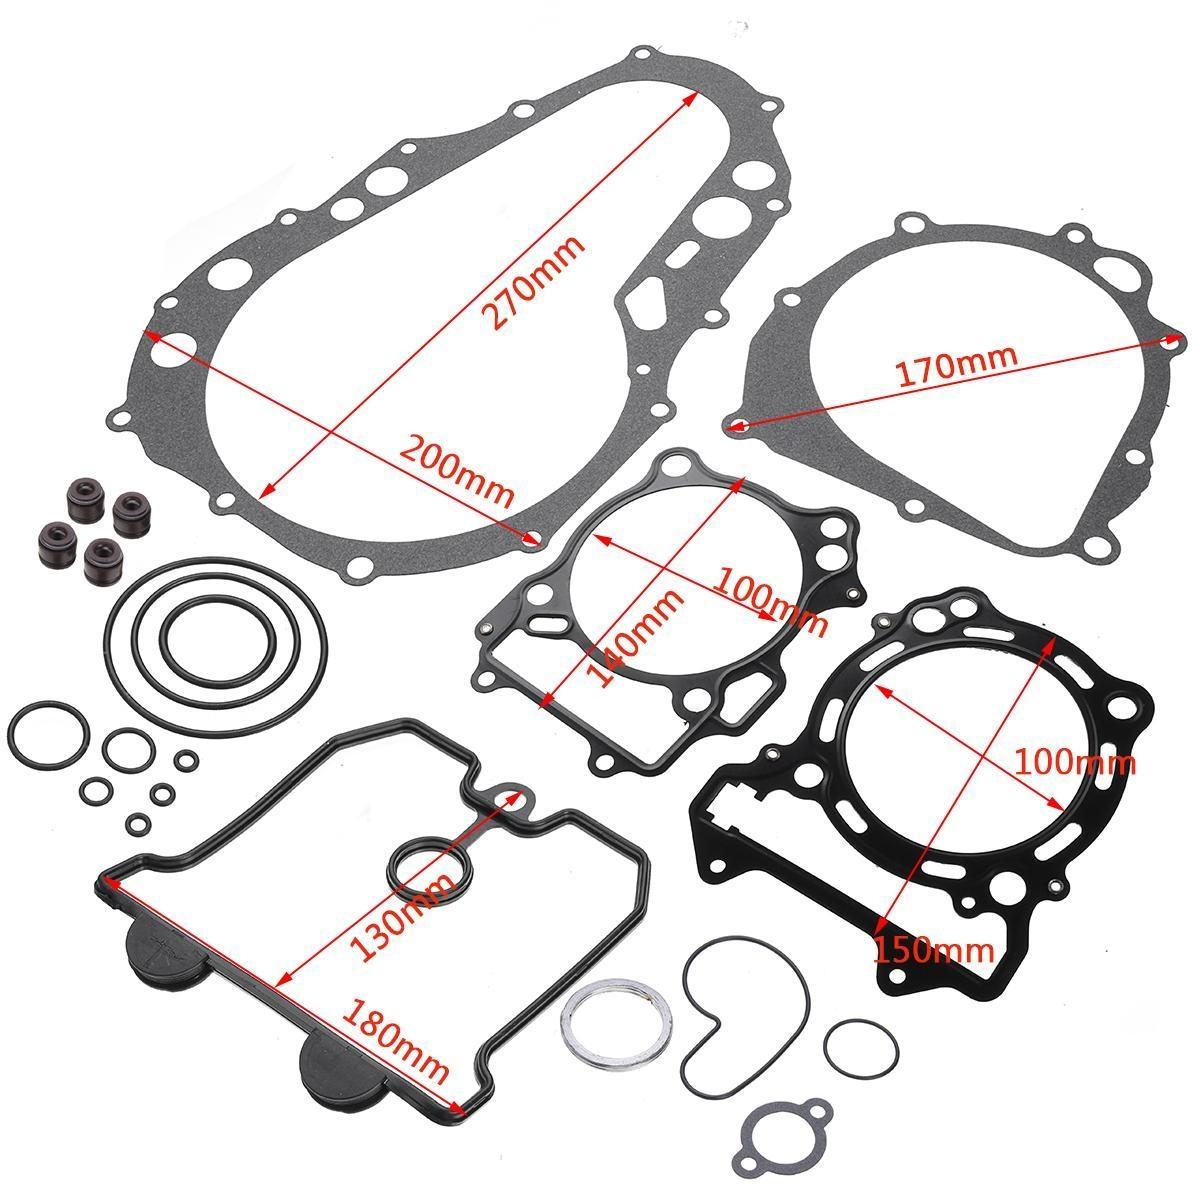 Cam Chain Open Inc Link BorgWarner Morse 94 Links Honda CBF 125 M 2009-2010